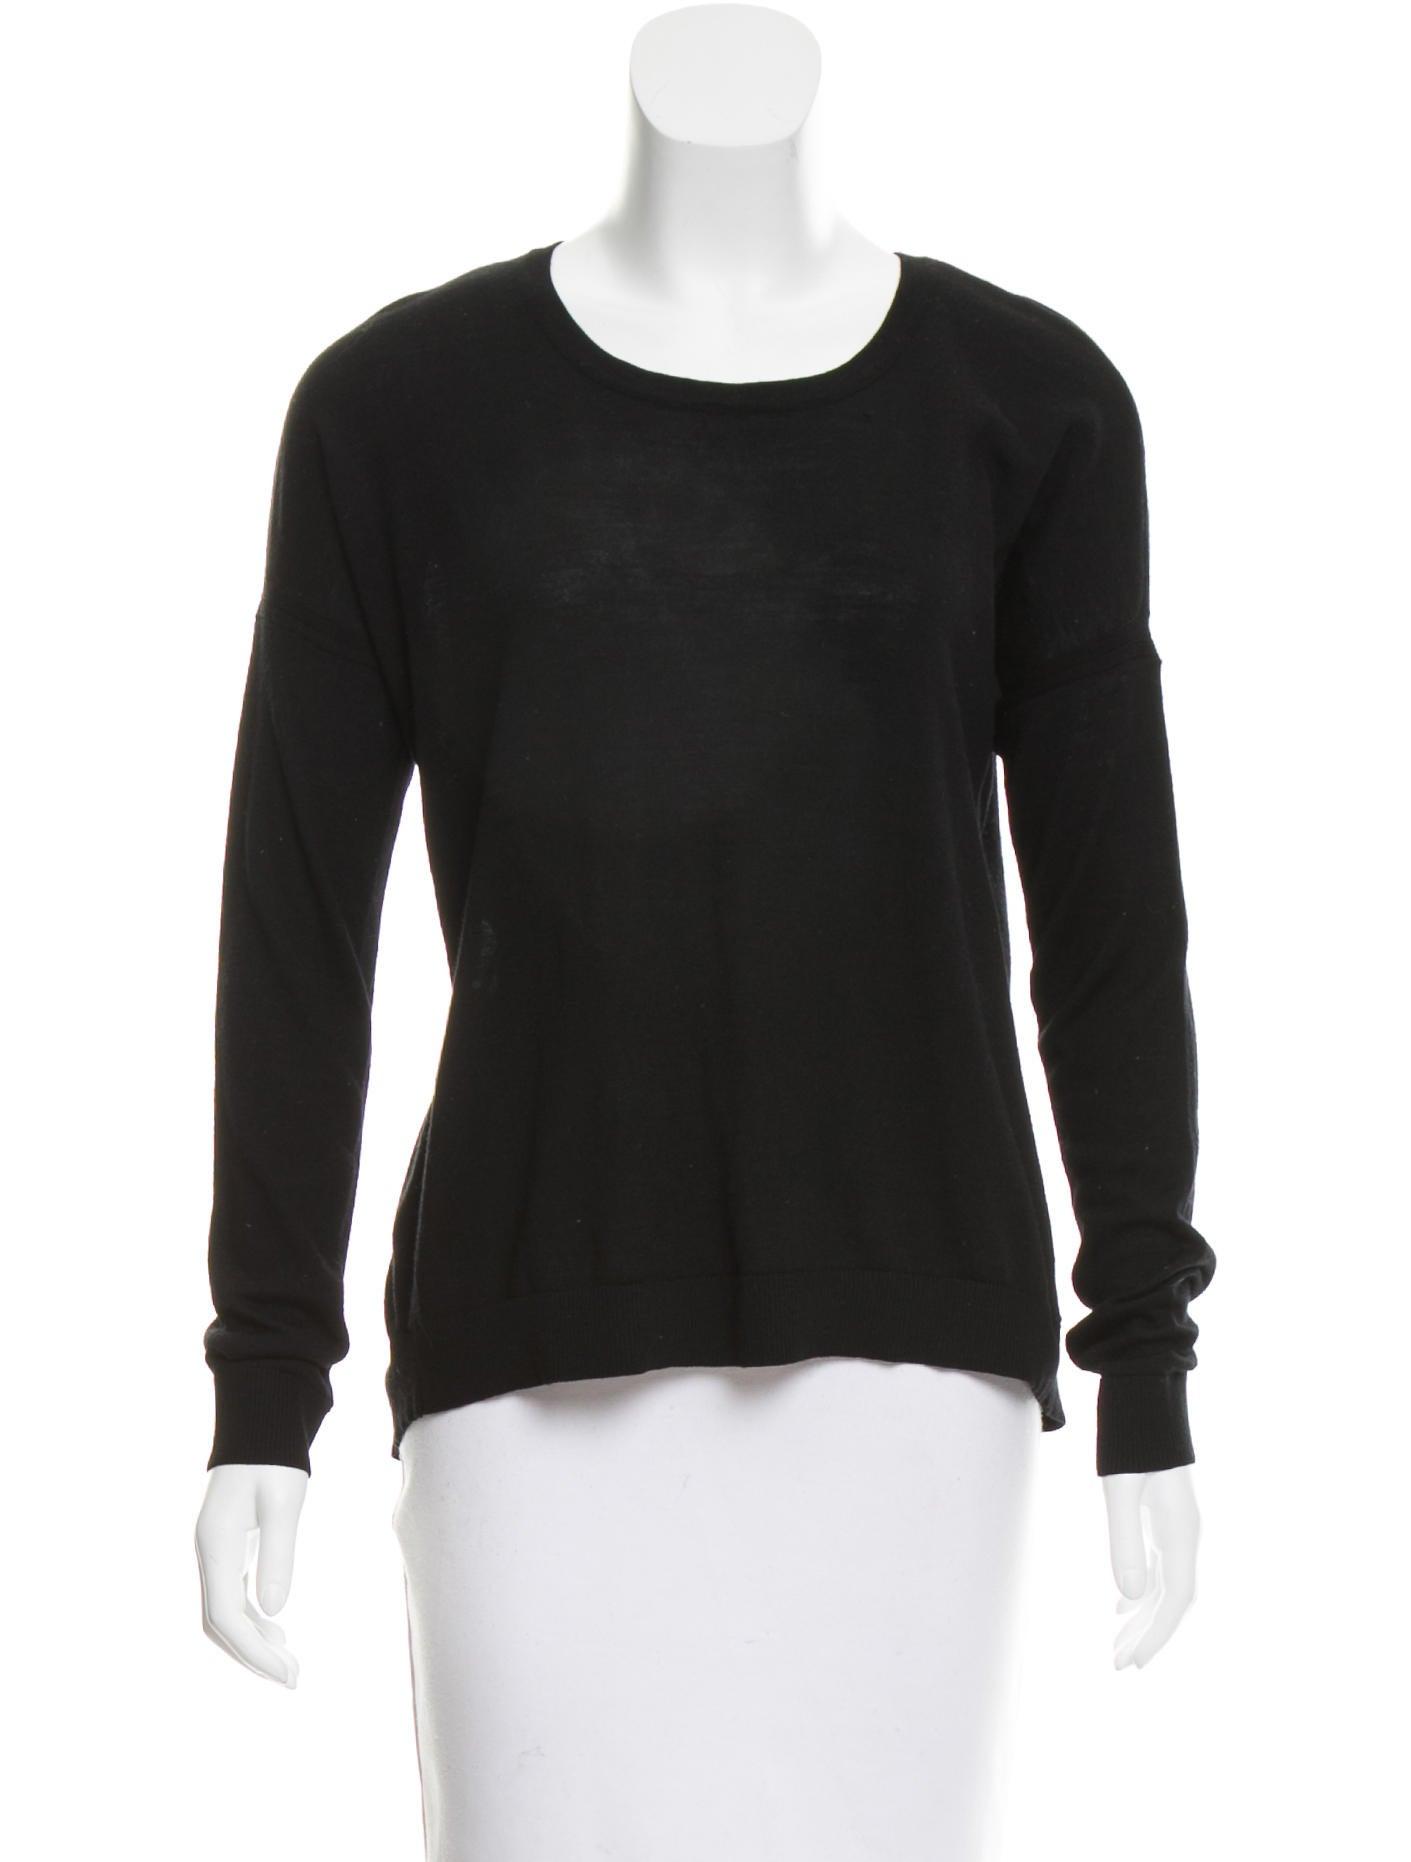 Rag bone wool long sleeve top clothing wragb69572 for Best wool shirt jackets